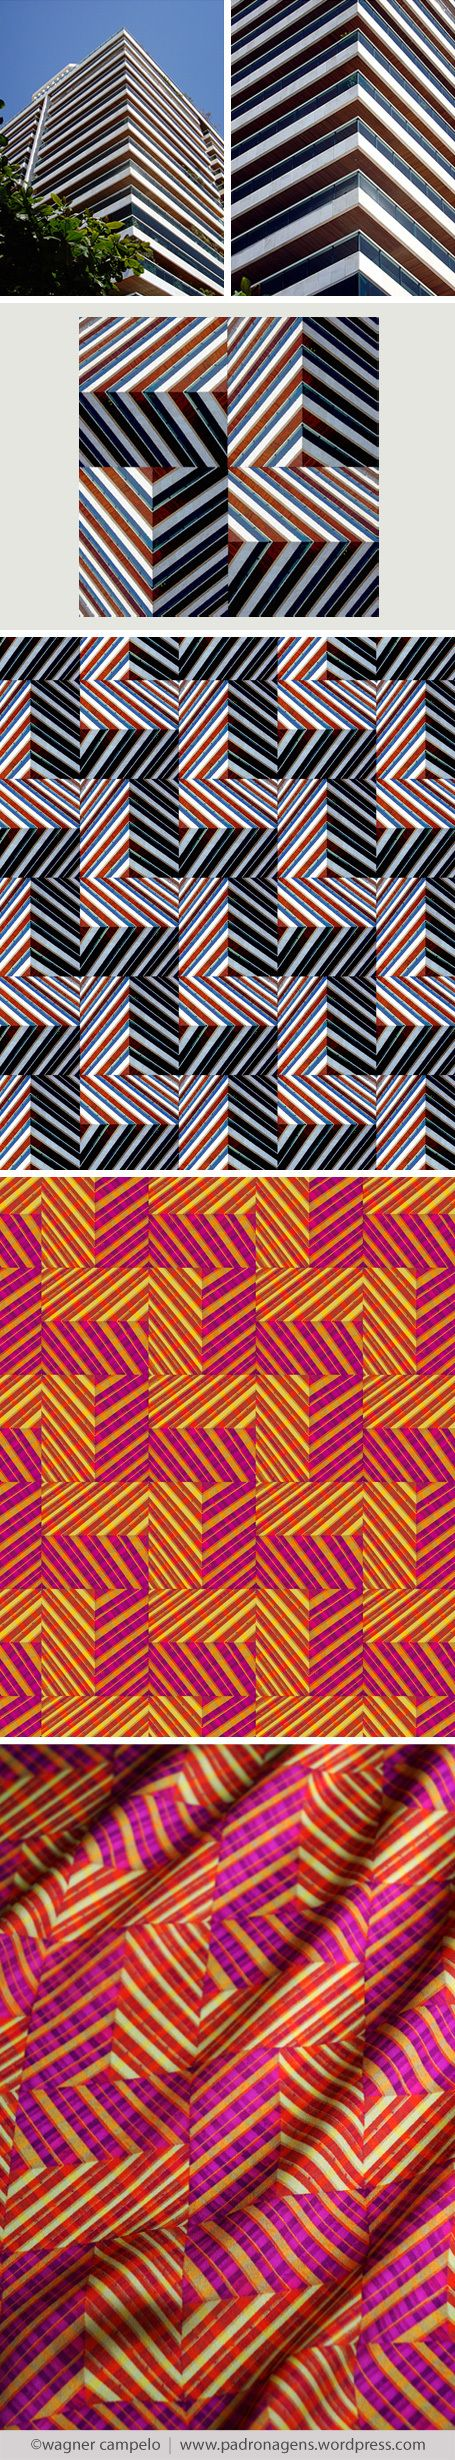 Creative process for prints from photos | Diagonal Chevron pattern.